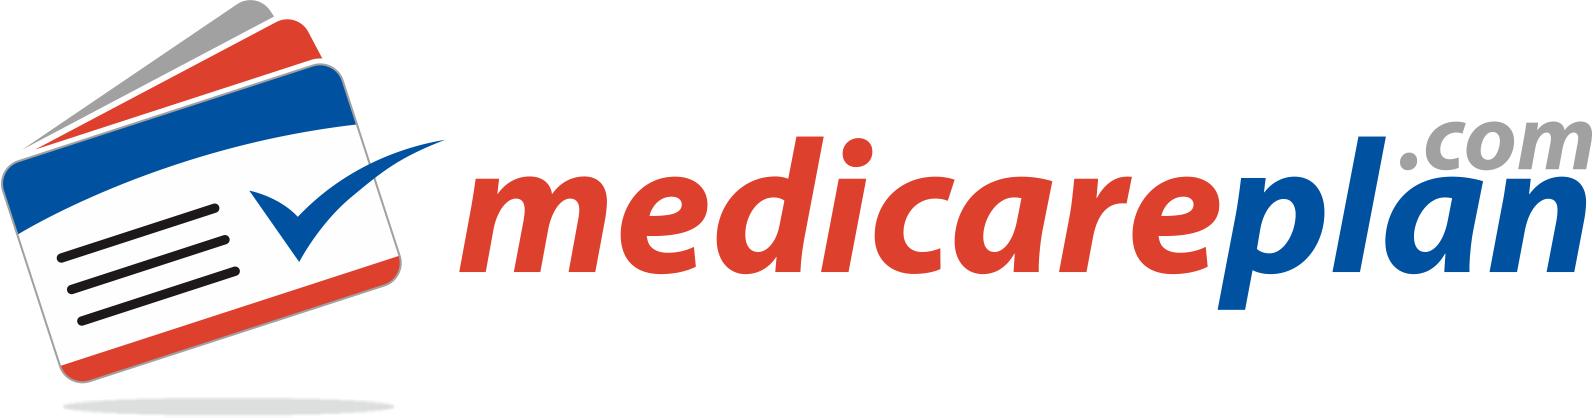 MedicarePlan.com Logo